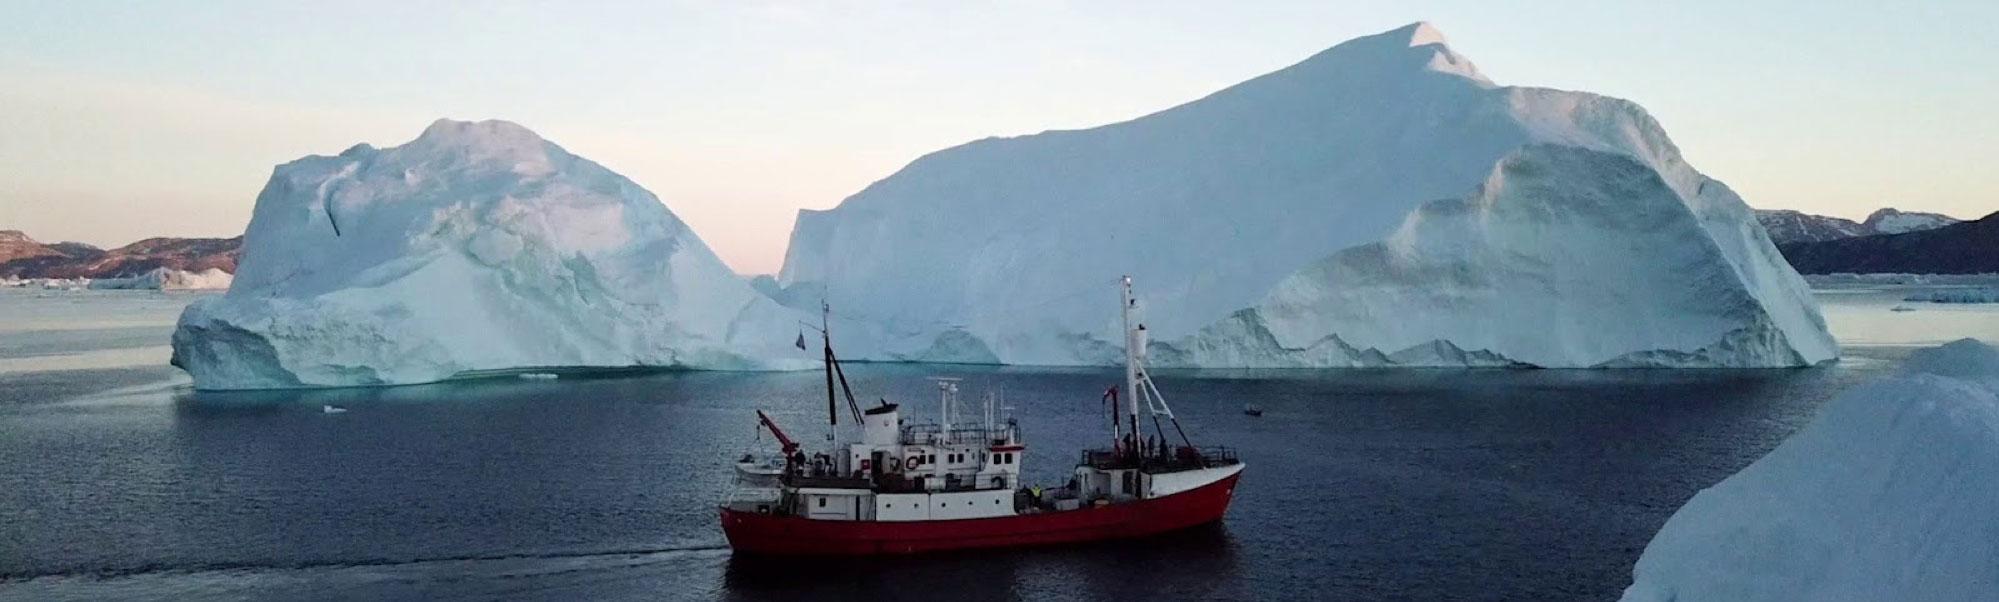 Cervino ship in the Arctic